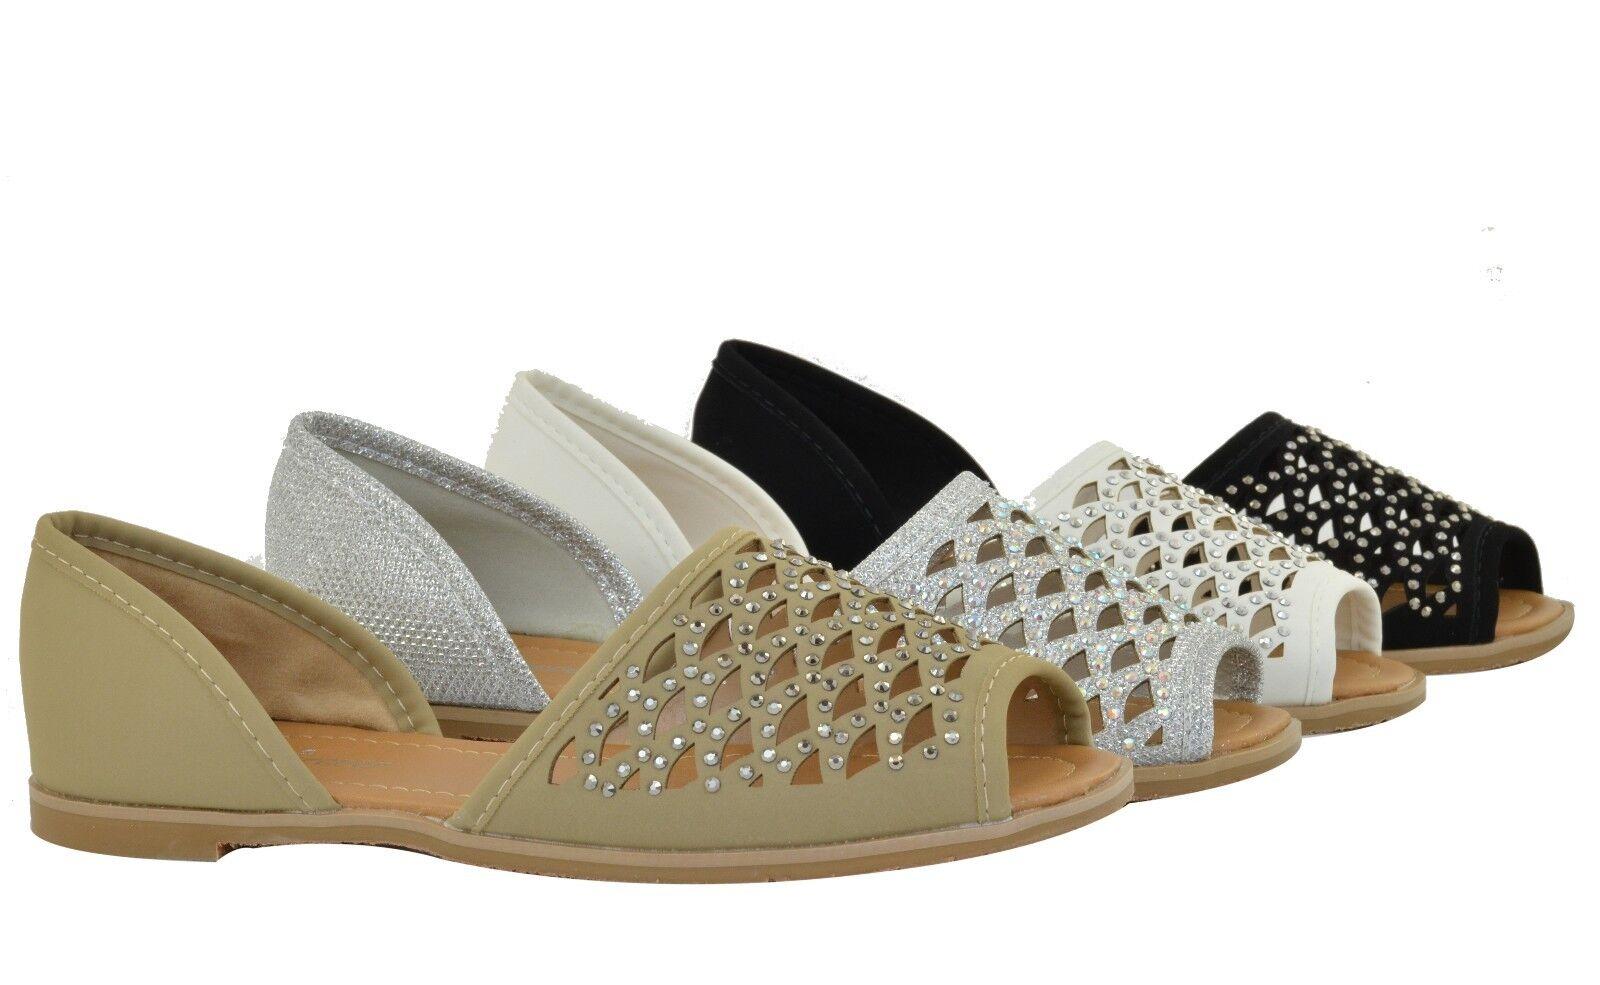 Women Sandals Flat Comfortable Design Fashion Cute Hollow Rhinestone Design Comfortable 24f7f6